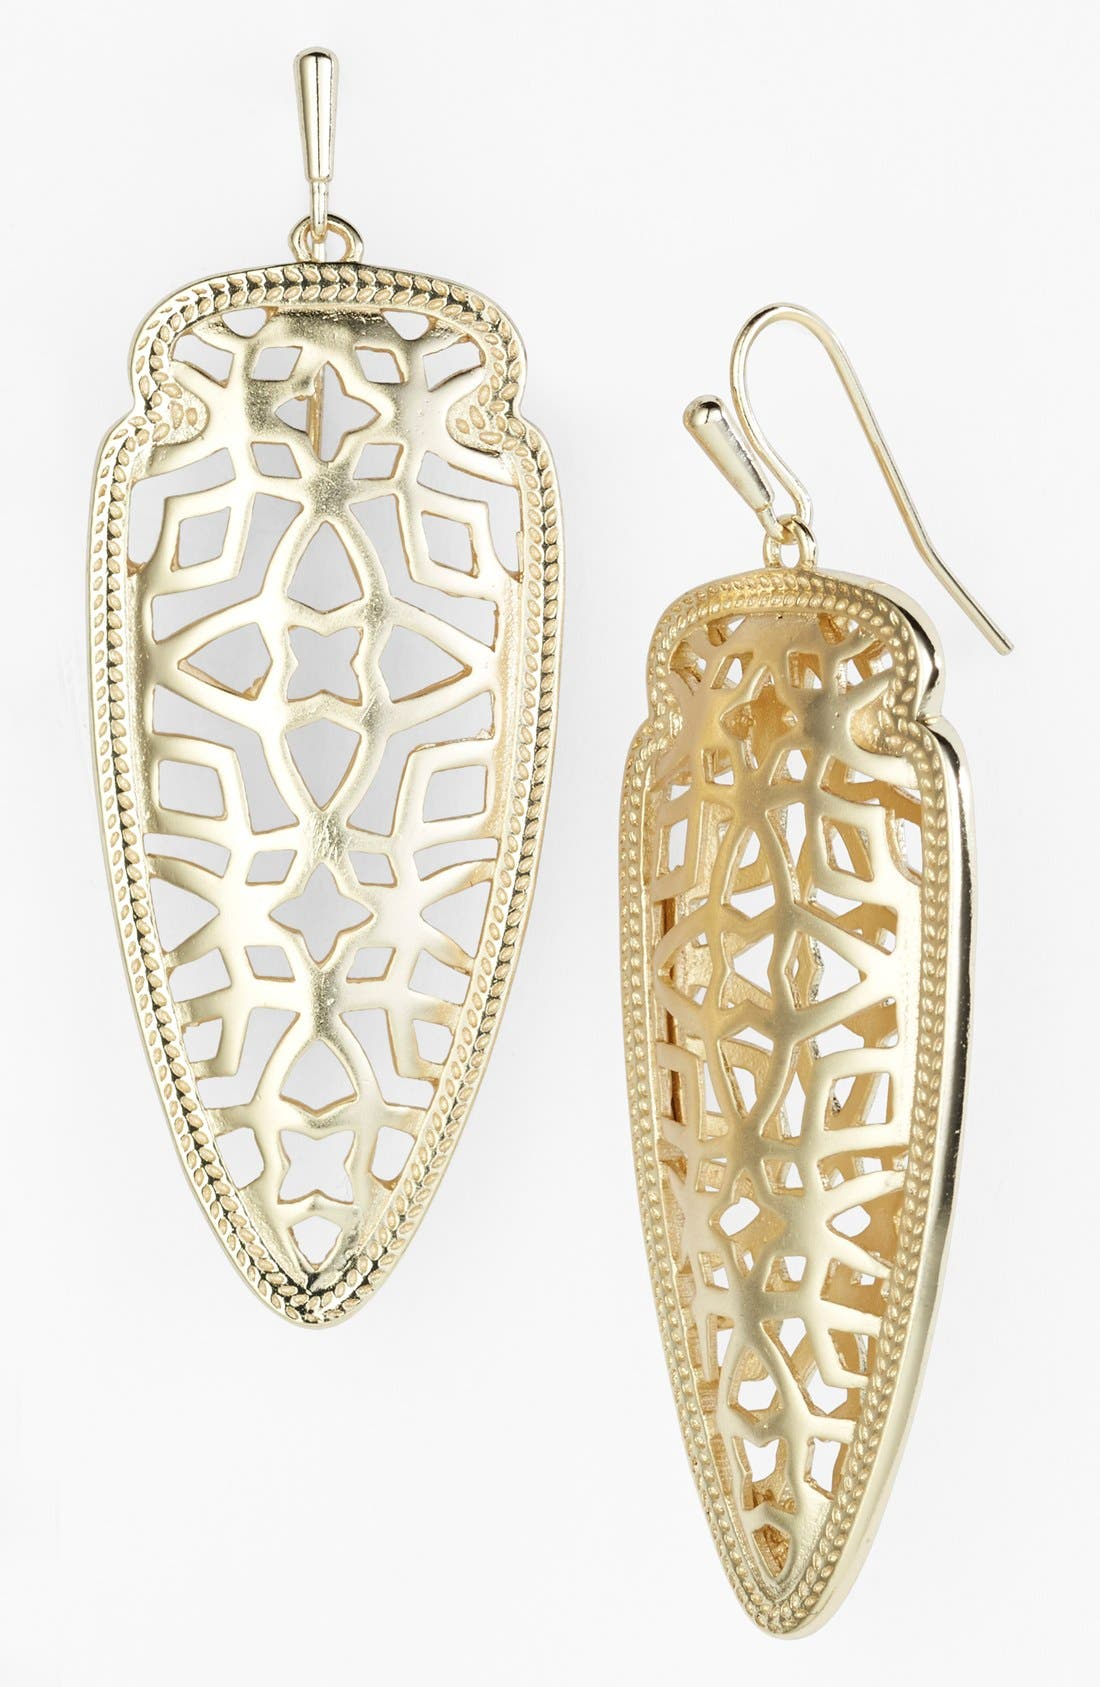 Main Image - Kendra Scott 'Glam Rocks - Sadie' Drop Earrings